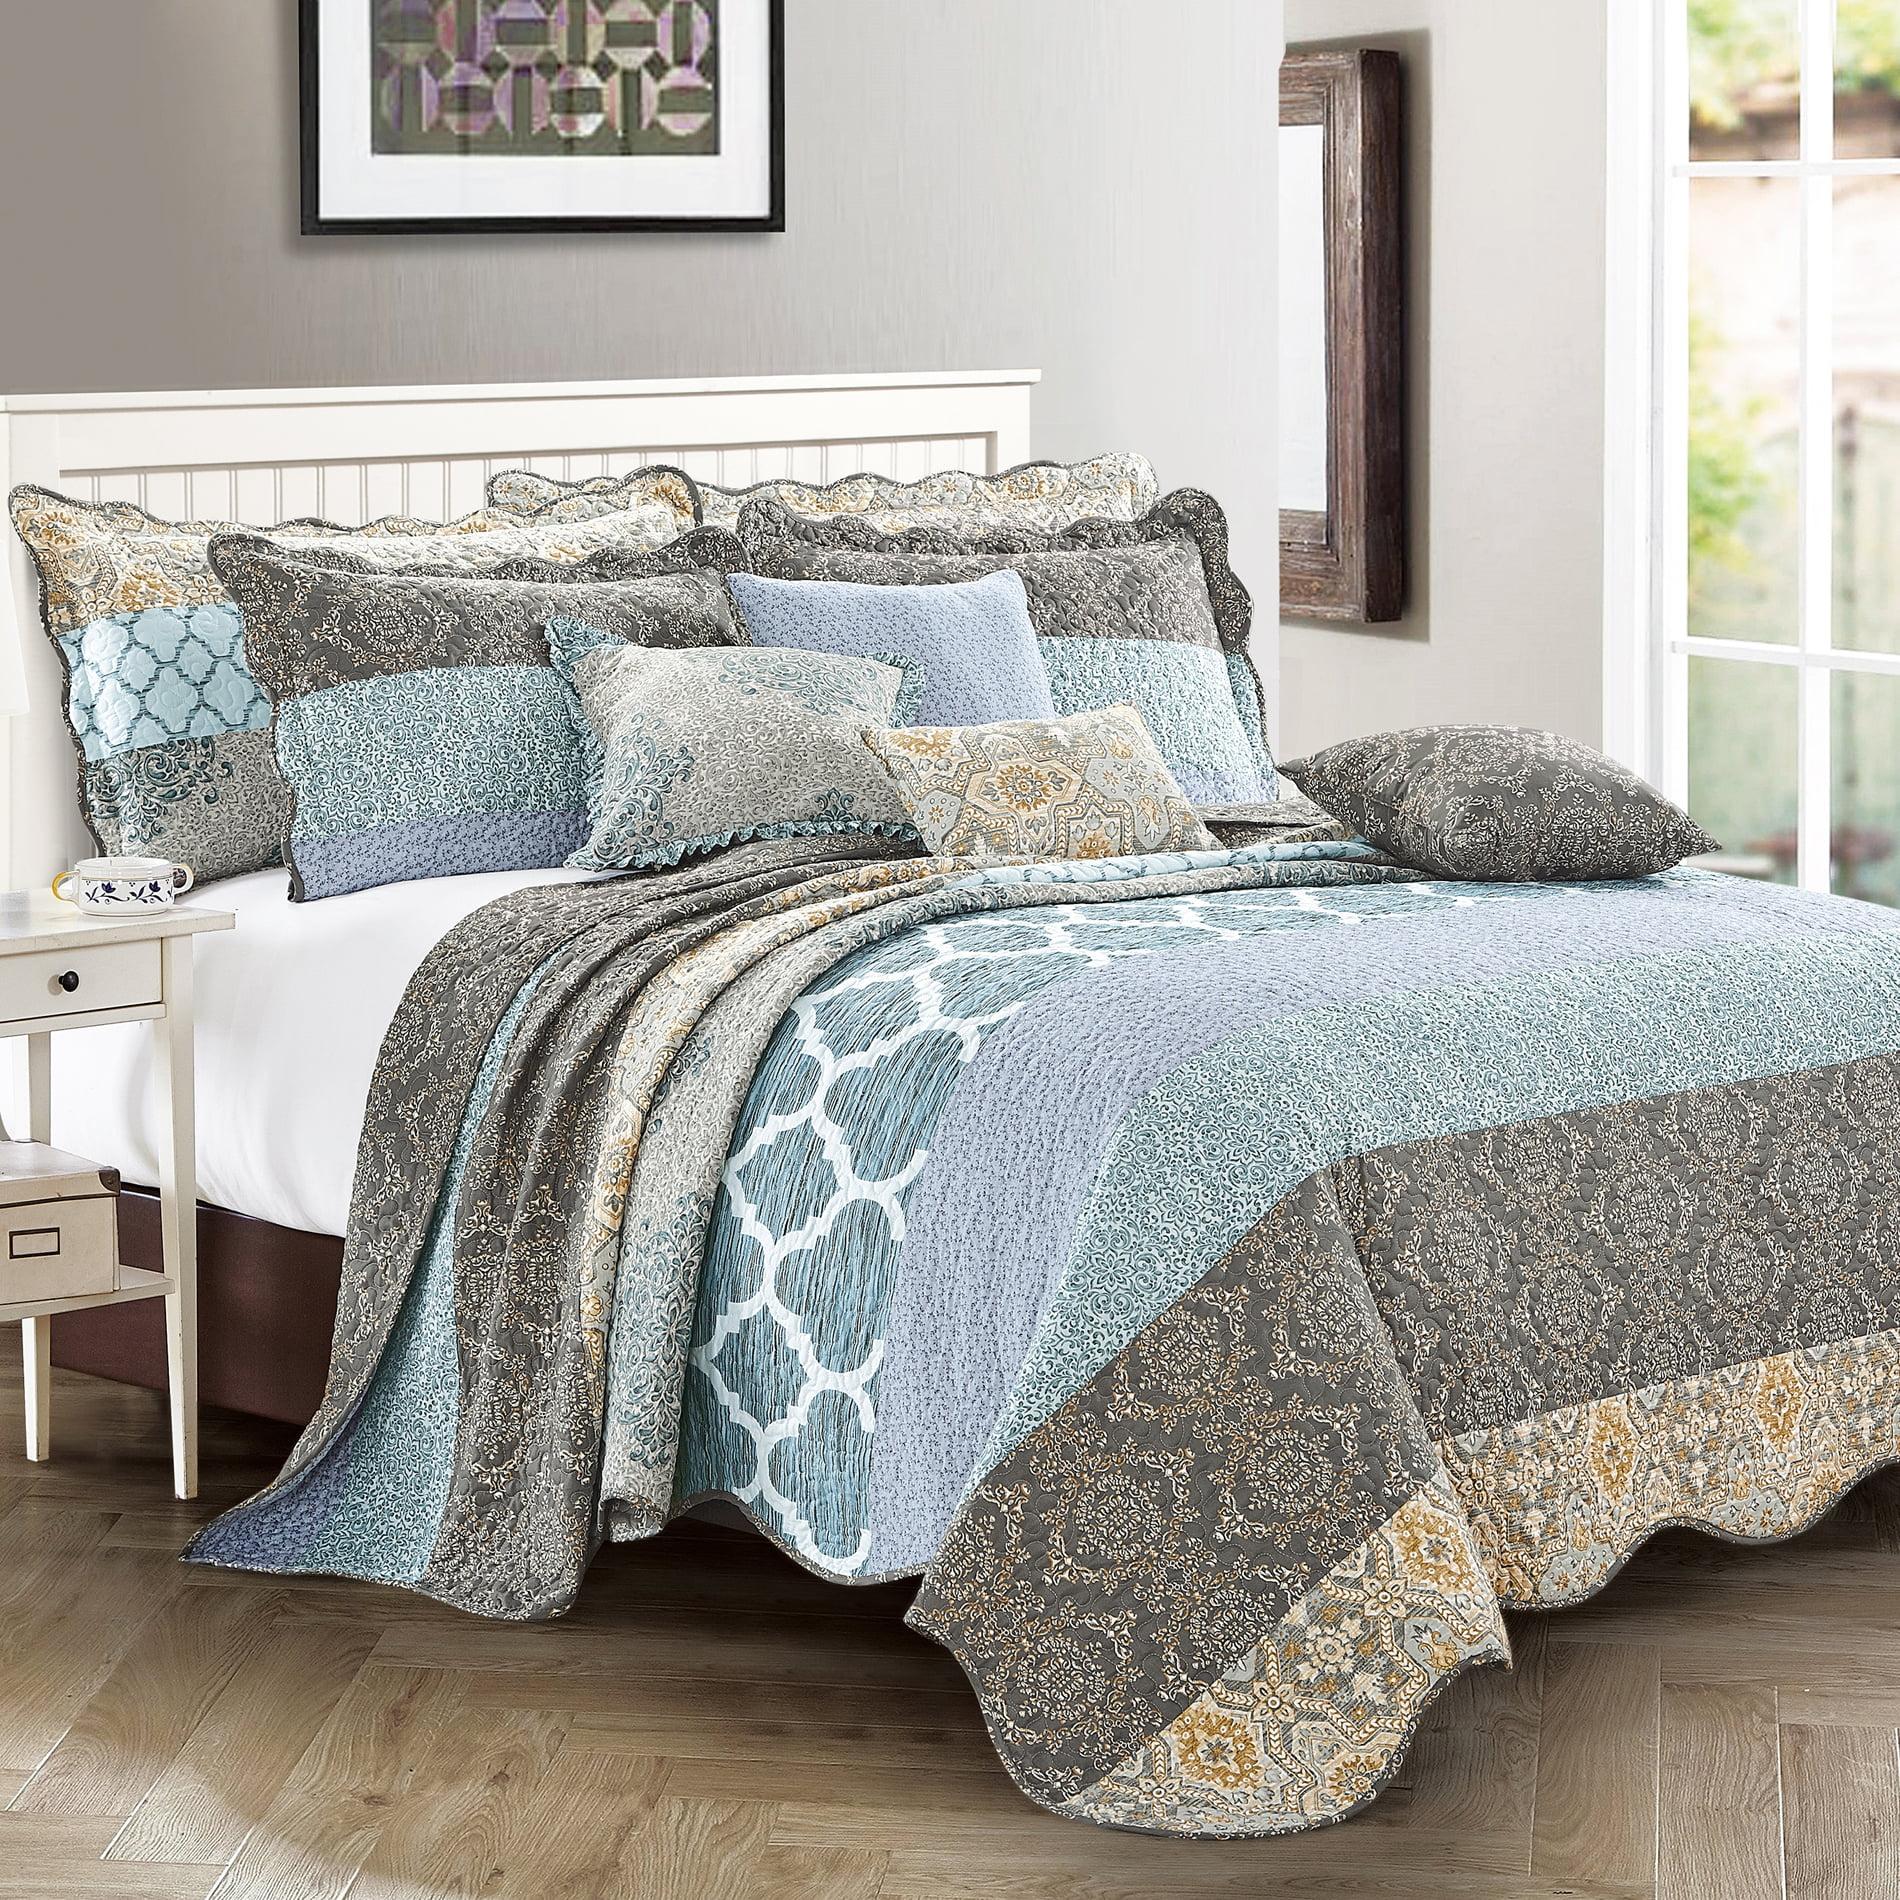 9 Piece Striped Bed Spread Set